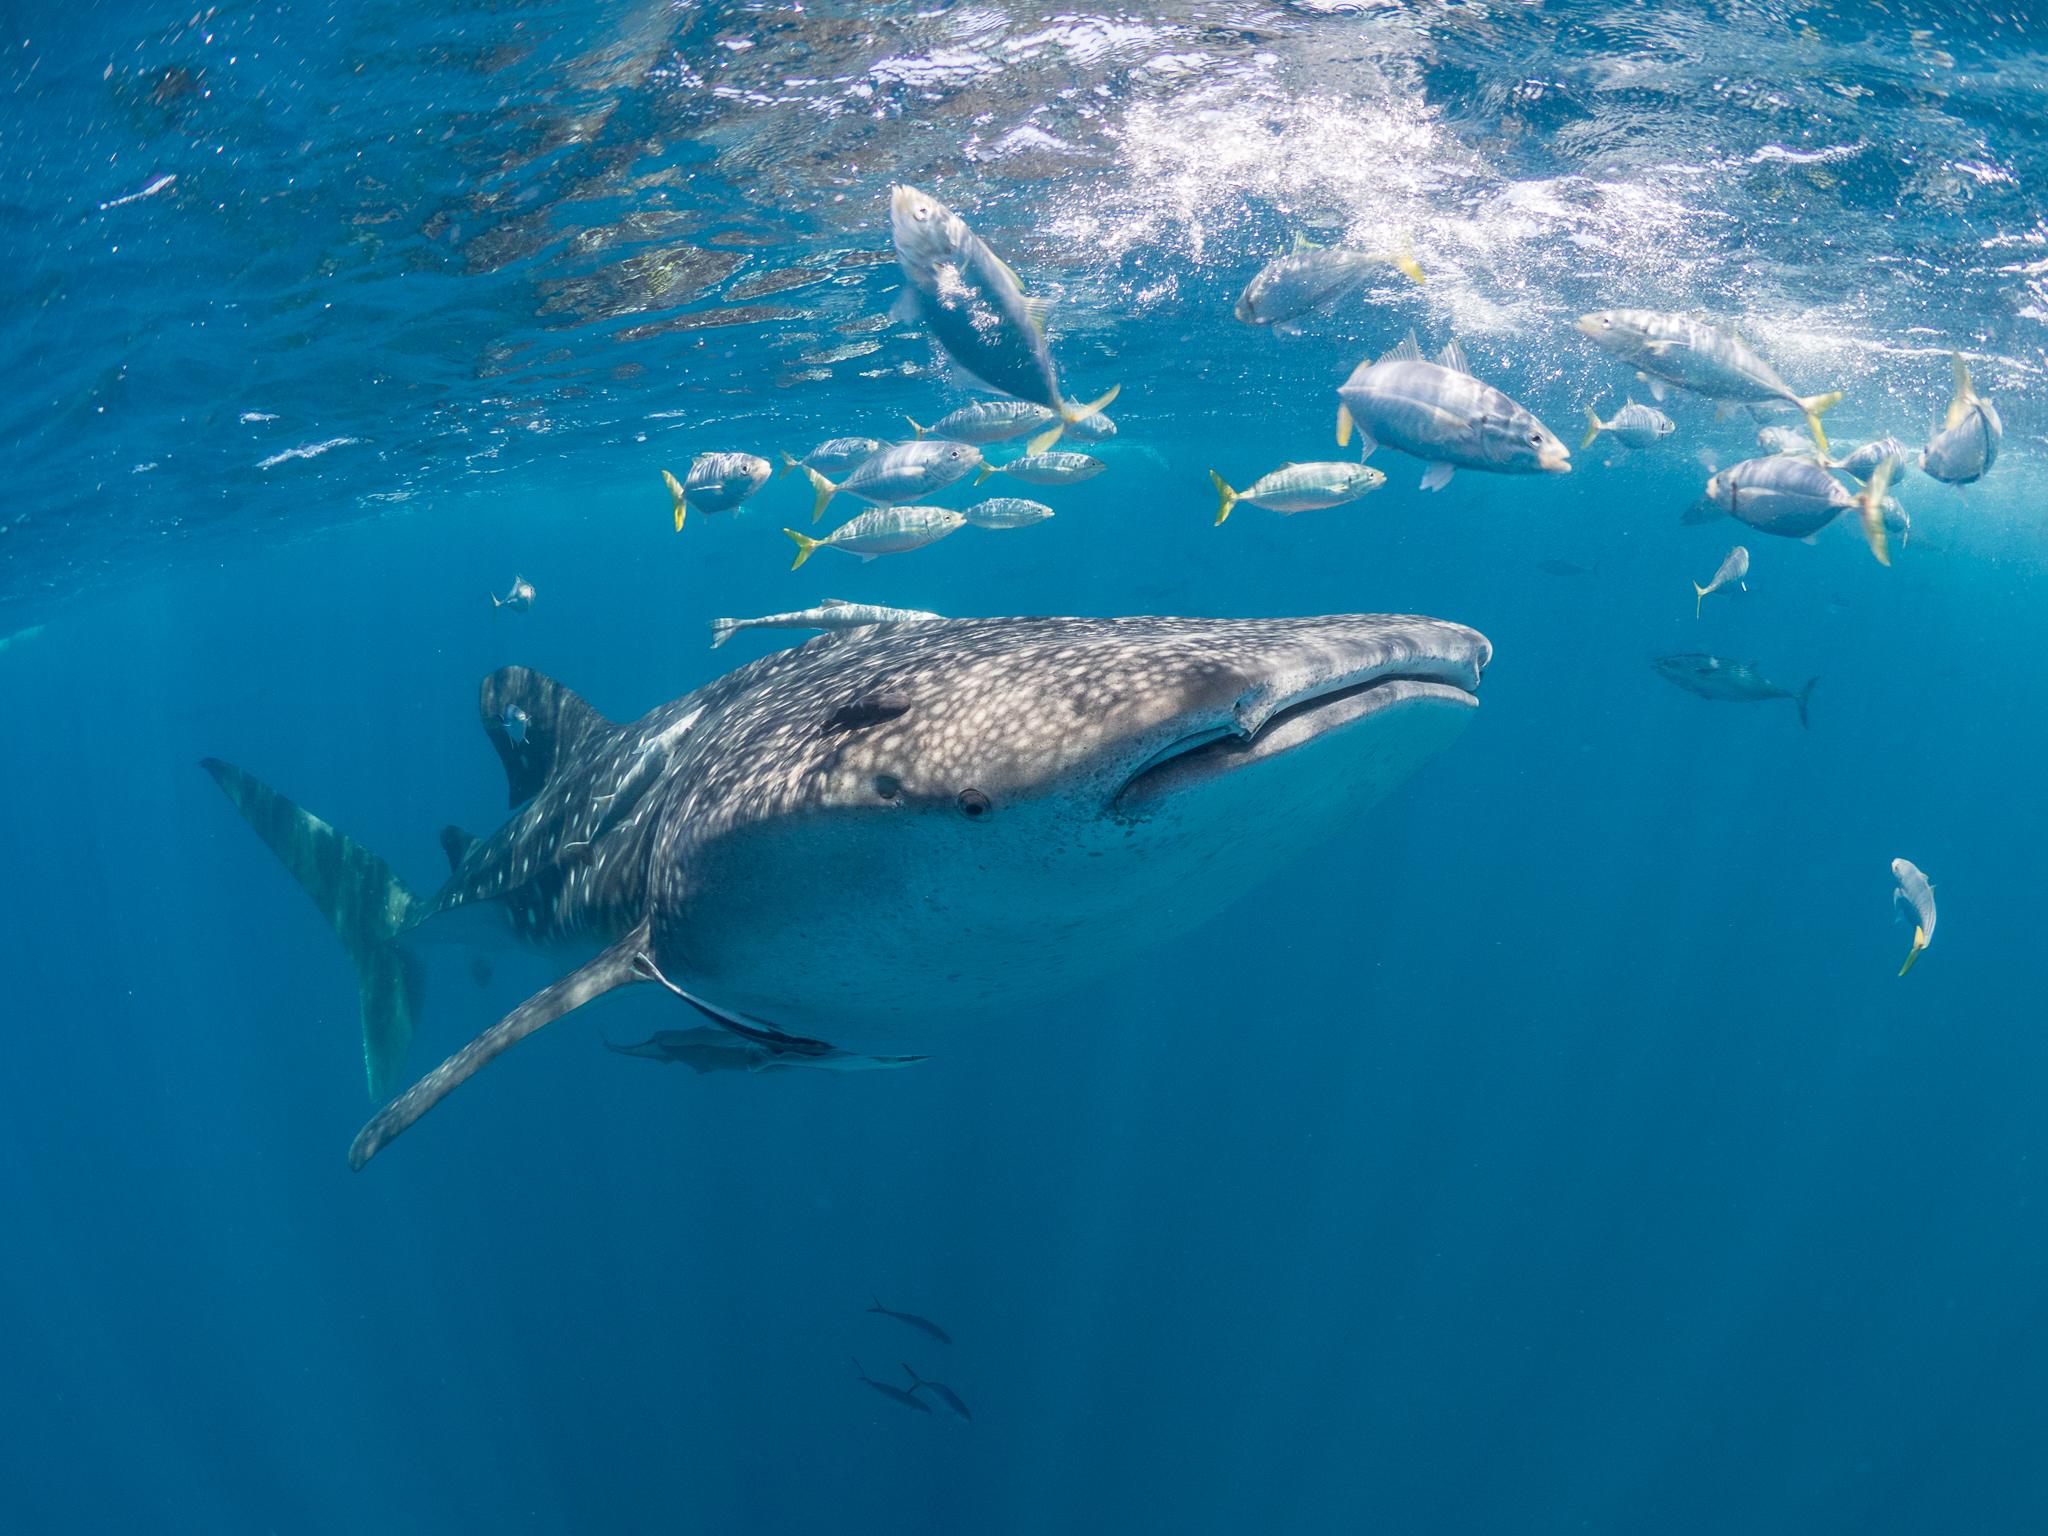 Whale share surrounded by a school of fish. Photo: Simon J. Pierce at www.simonjpierce.com